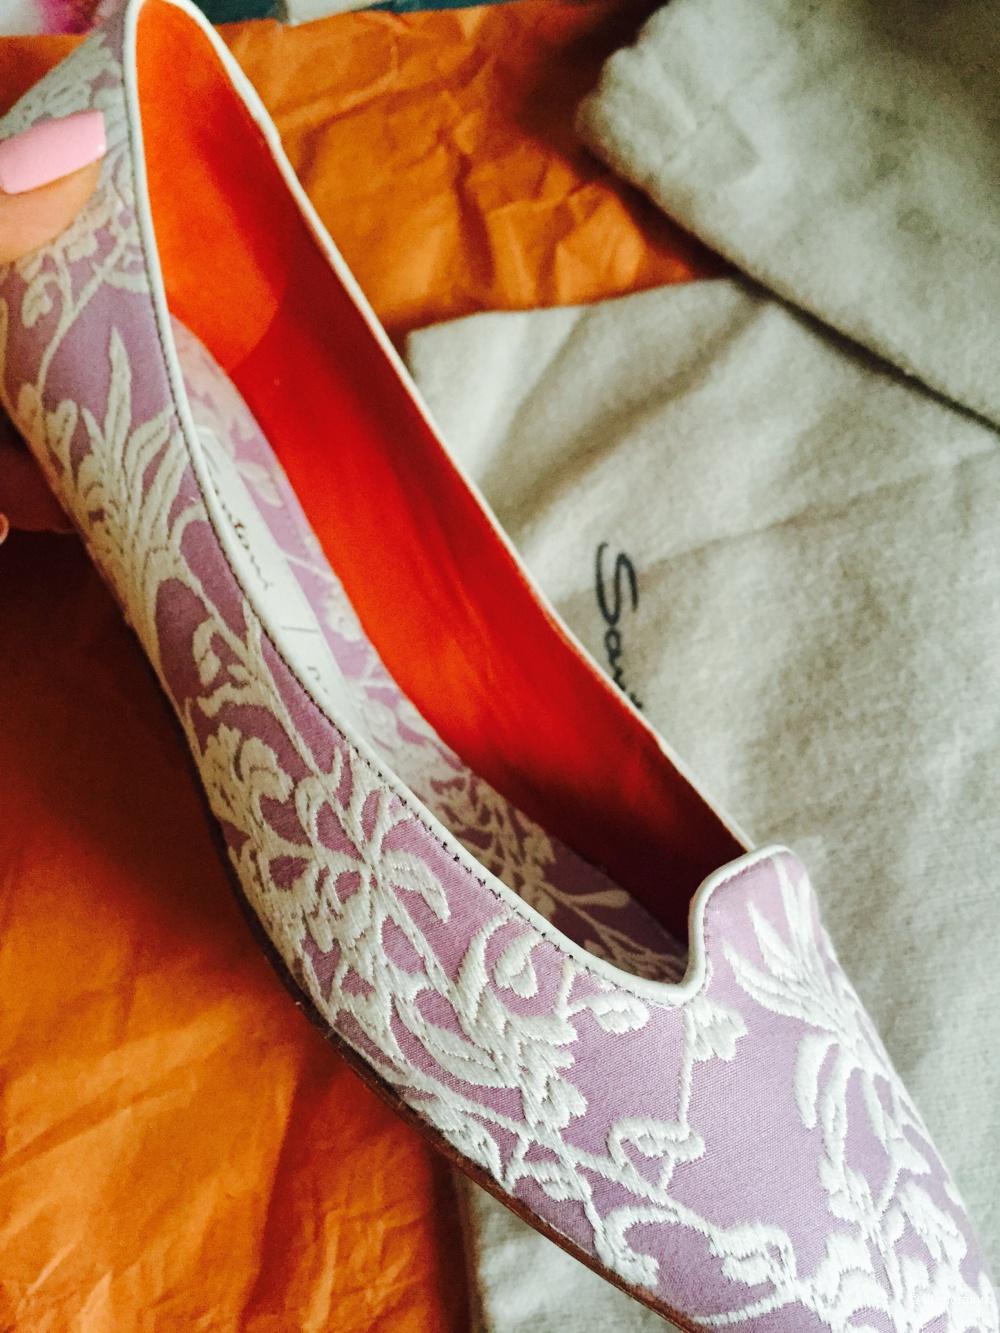 Мокасины Santoni/Rubelli, 37,5 размер, новые